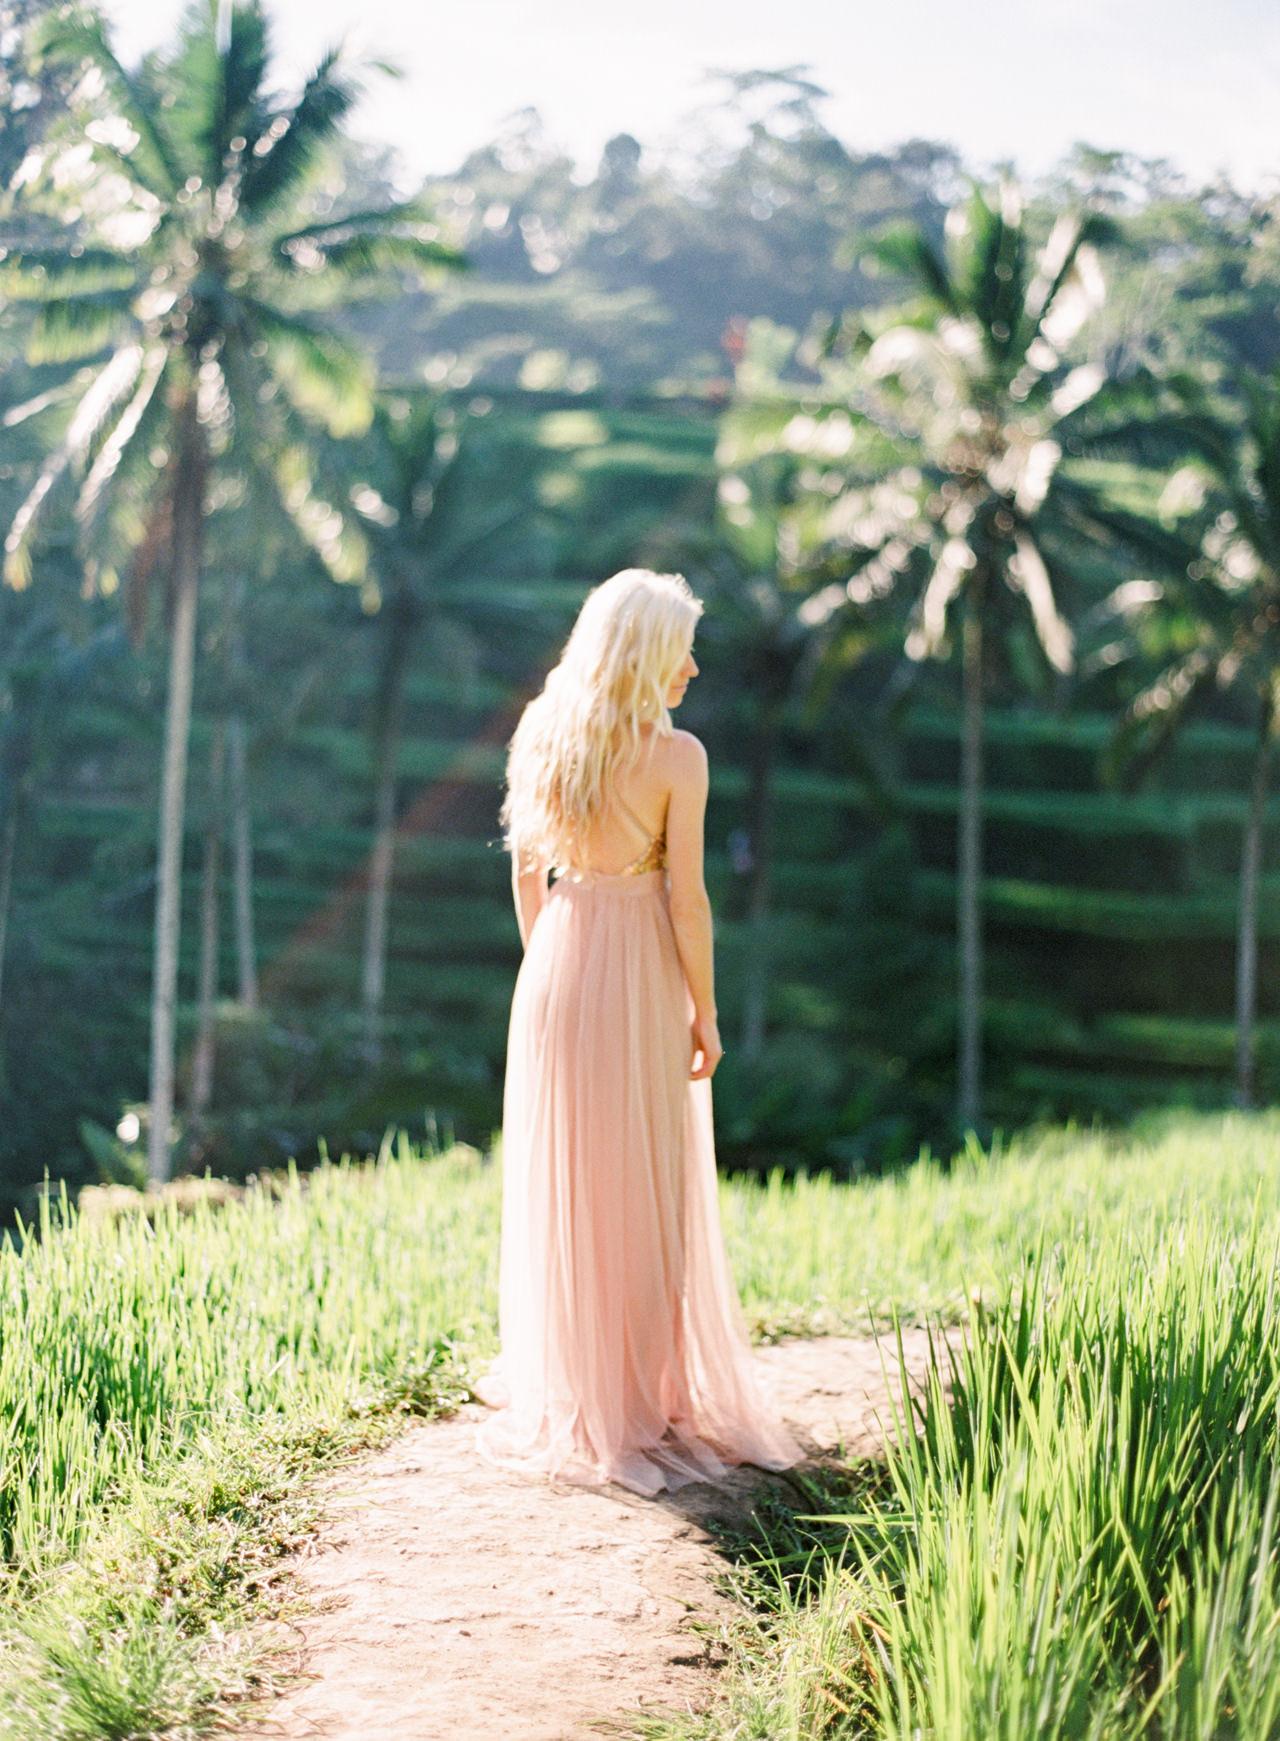 A&K: Magical Morning Photography at Tegalalang Rice Terrace 9